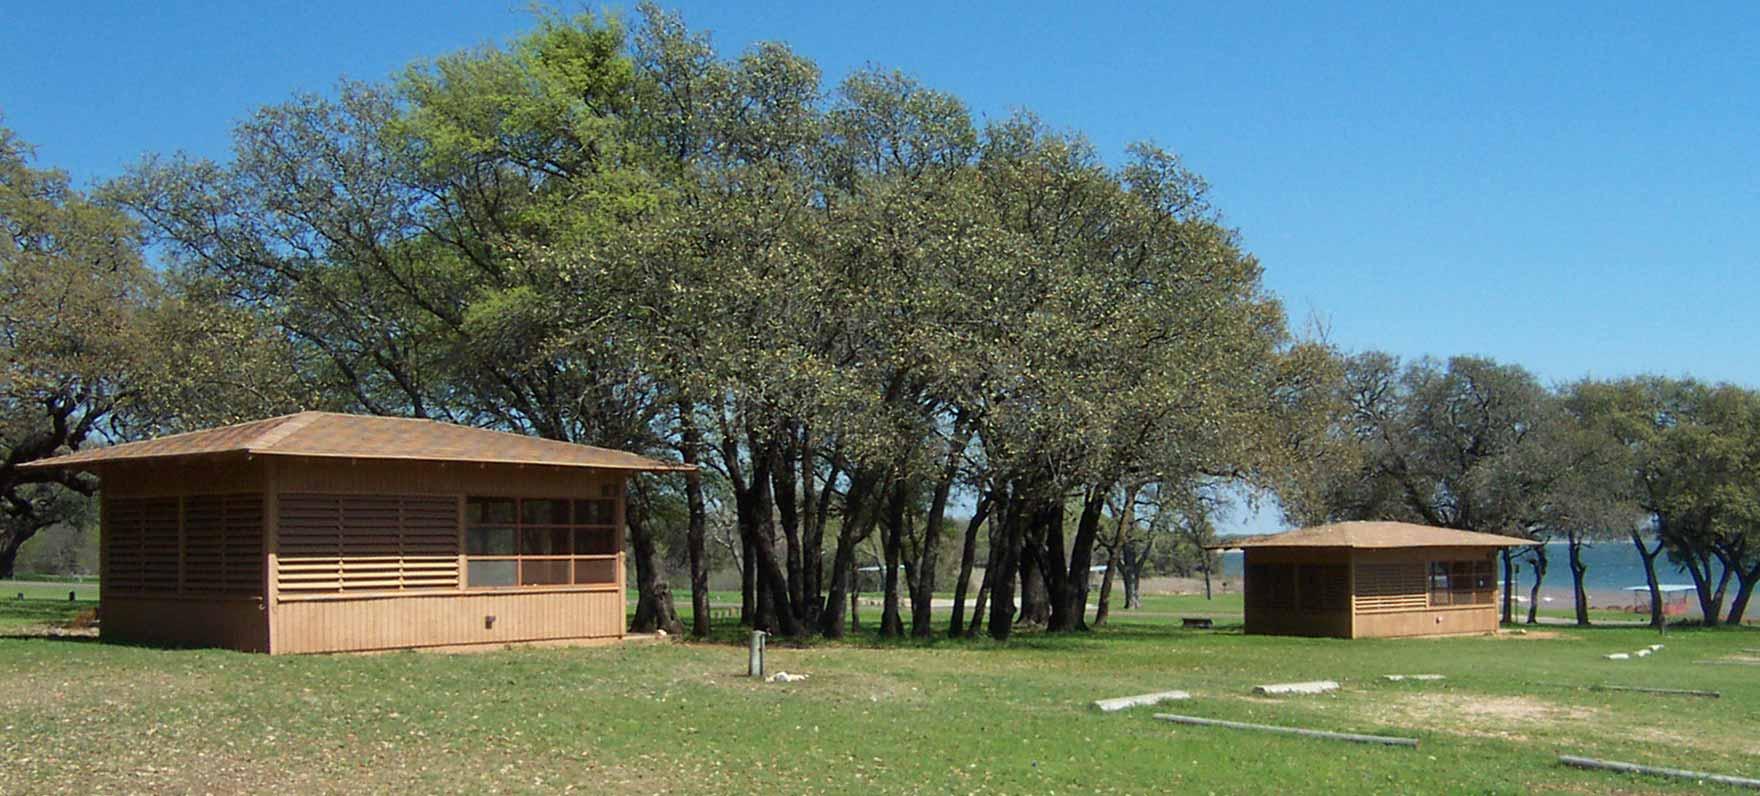 Lake Whitney State Park  Texas Parks  Wildlife Department